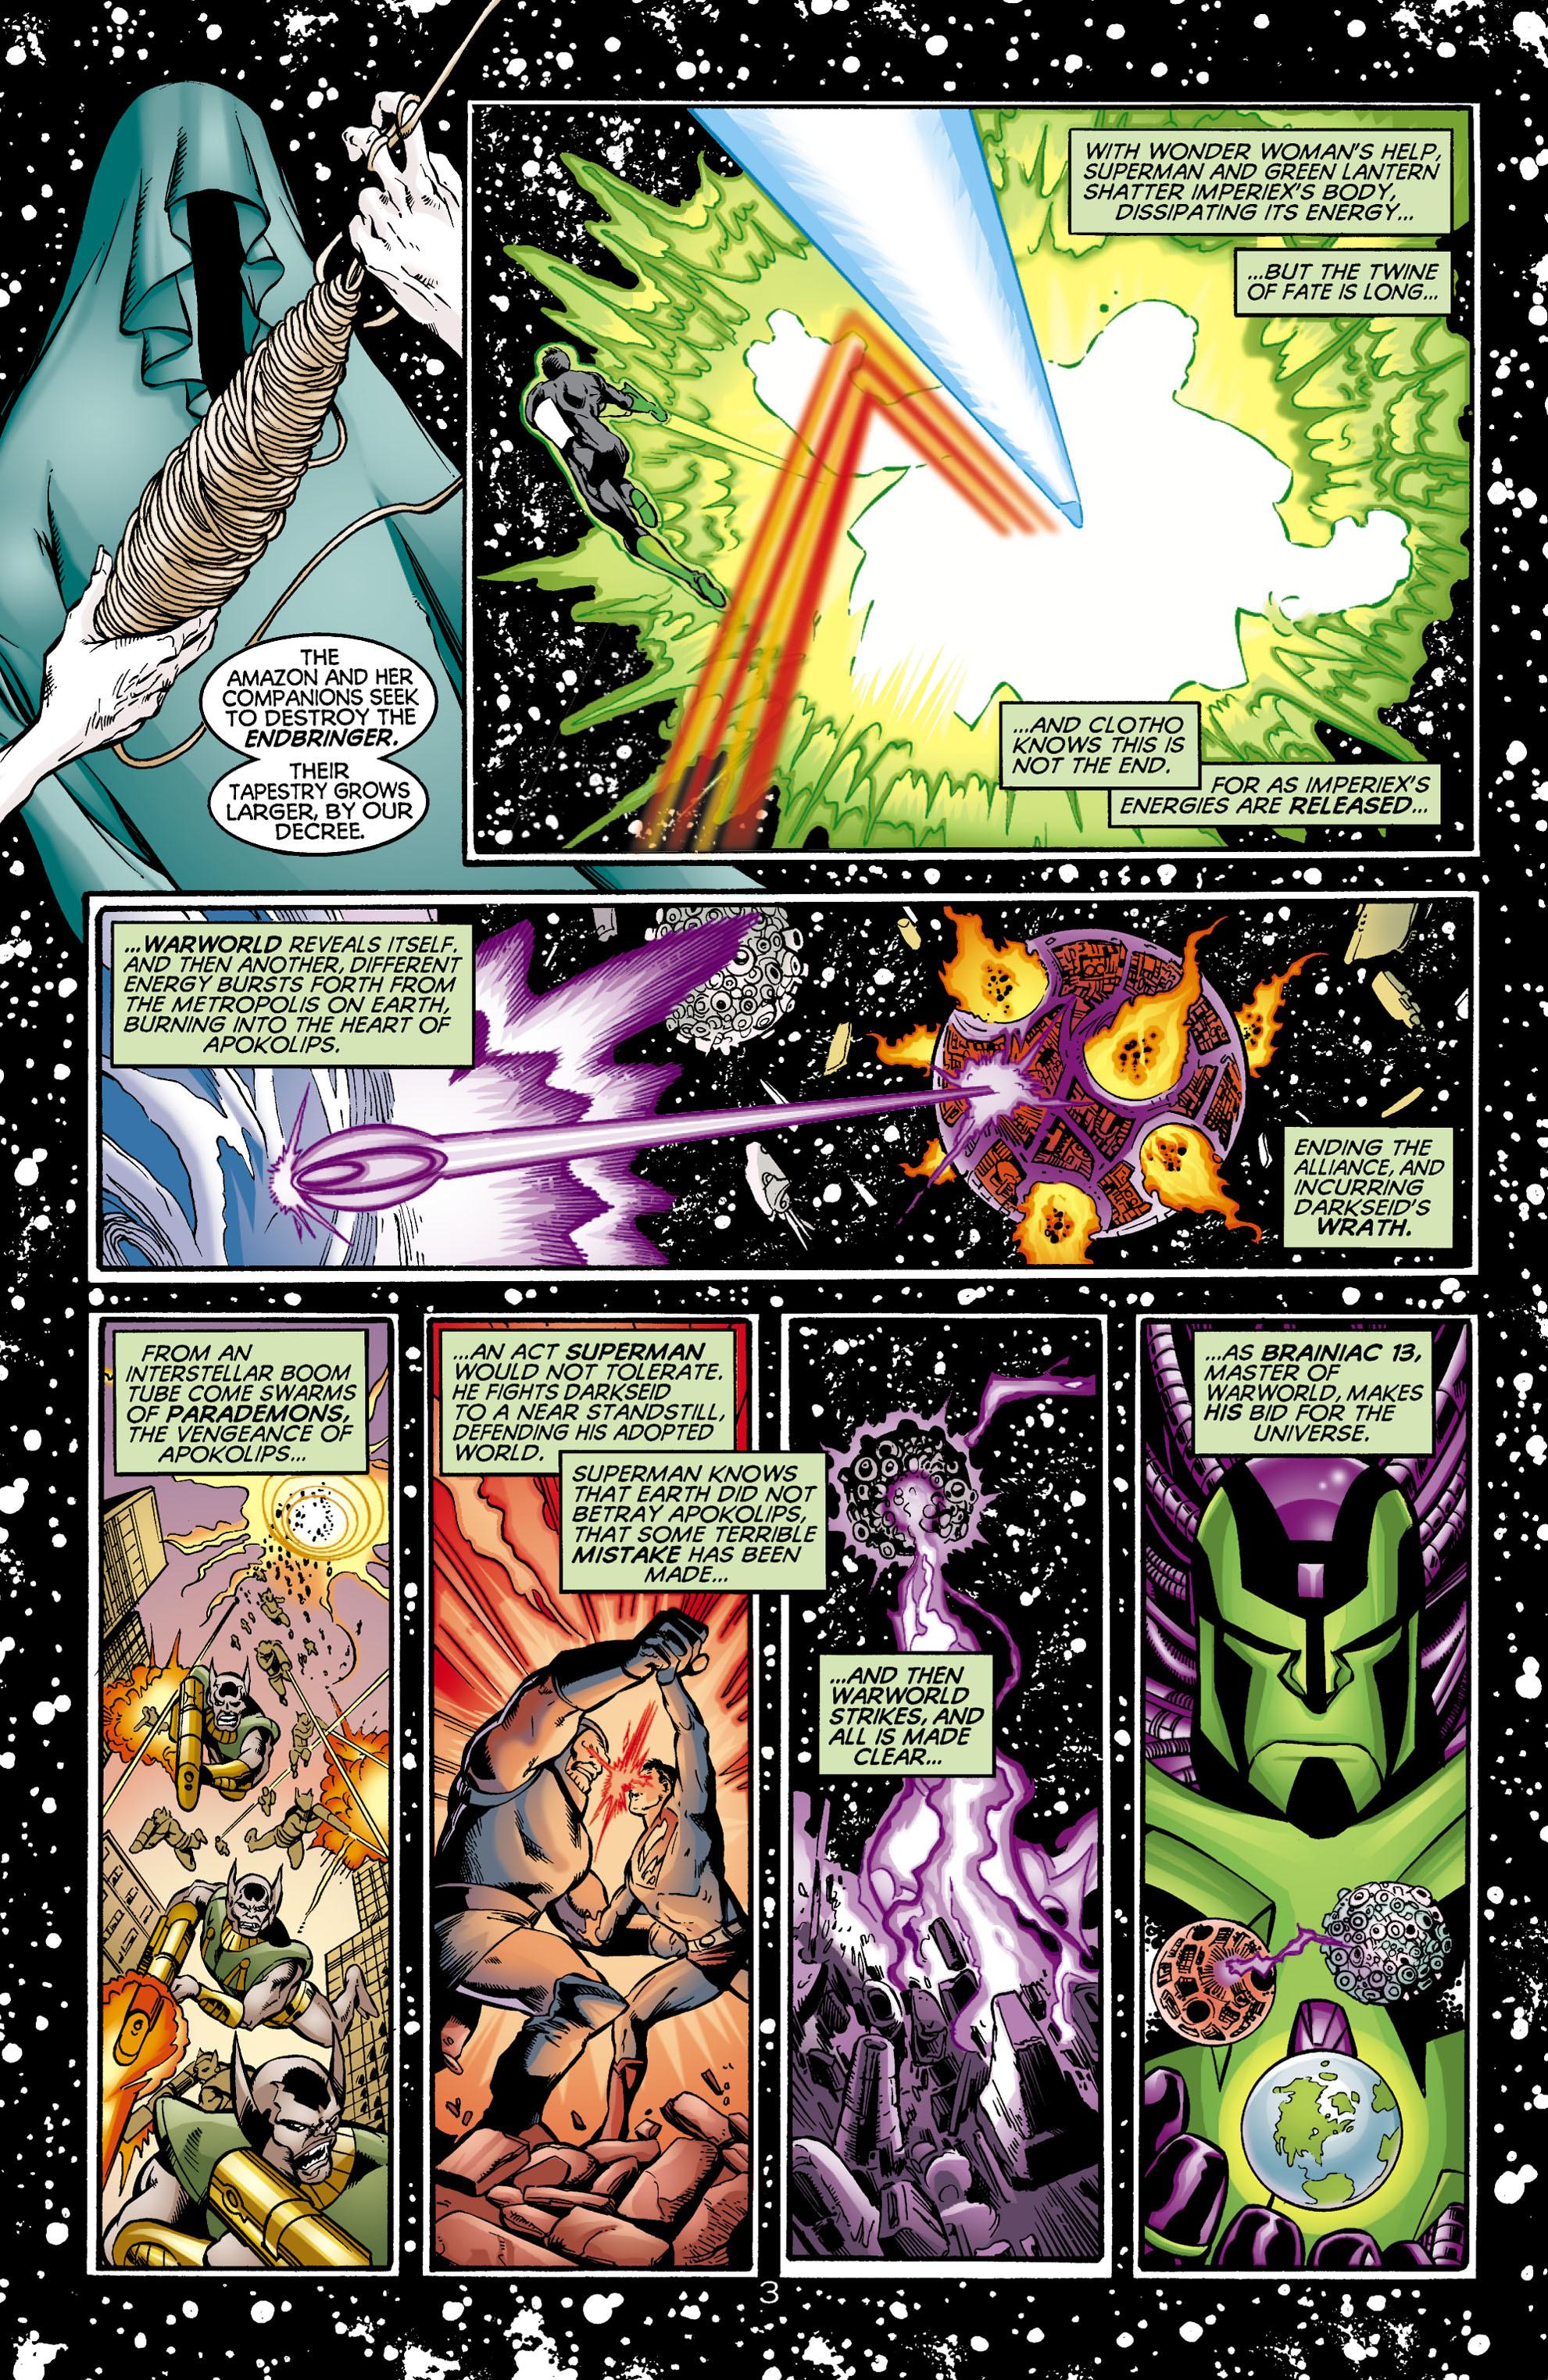 Read online Wonder Woman (1987) comic -  Issue #173 - 4